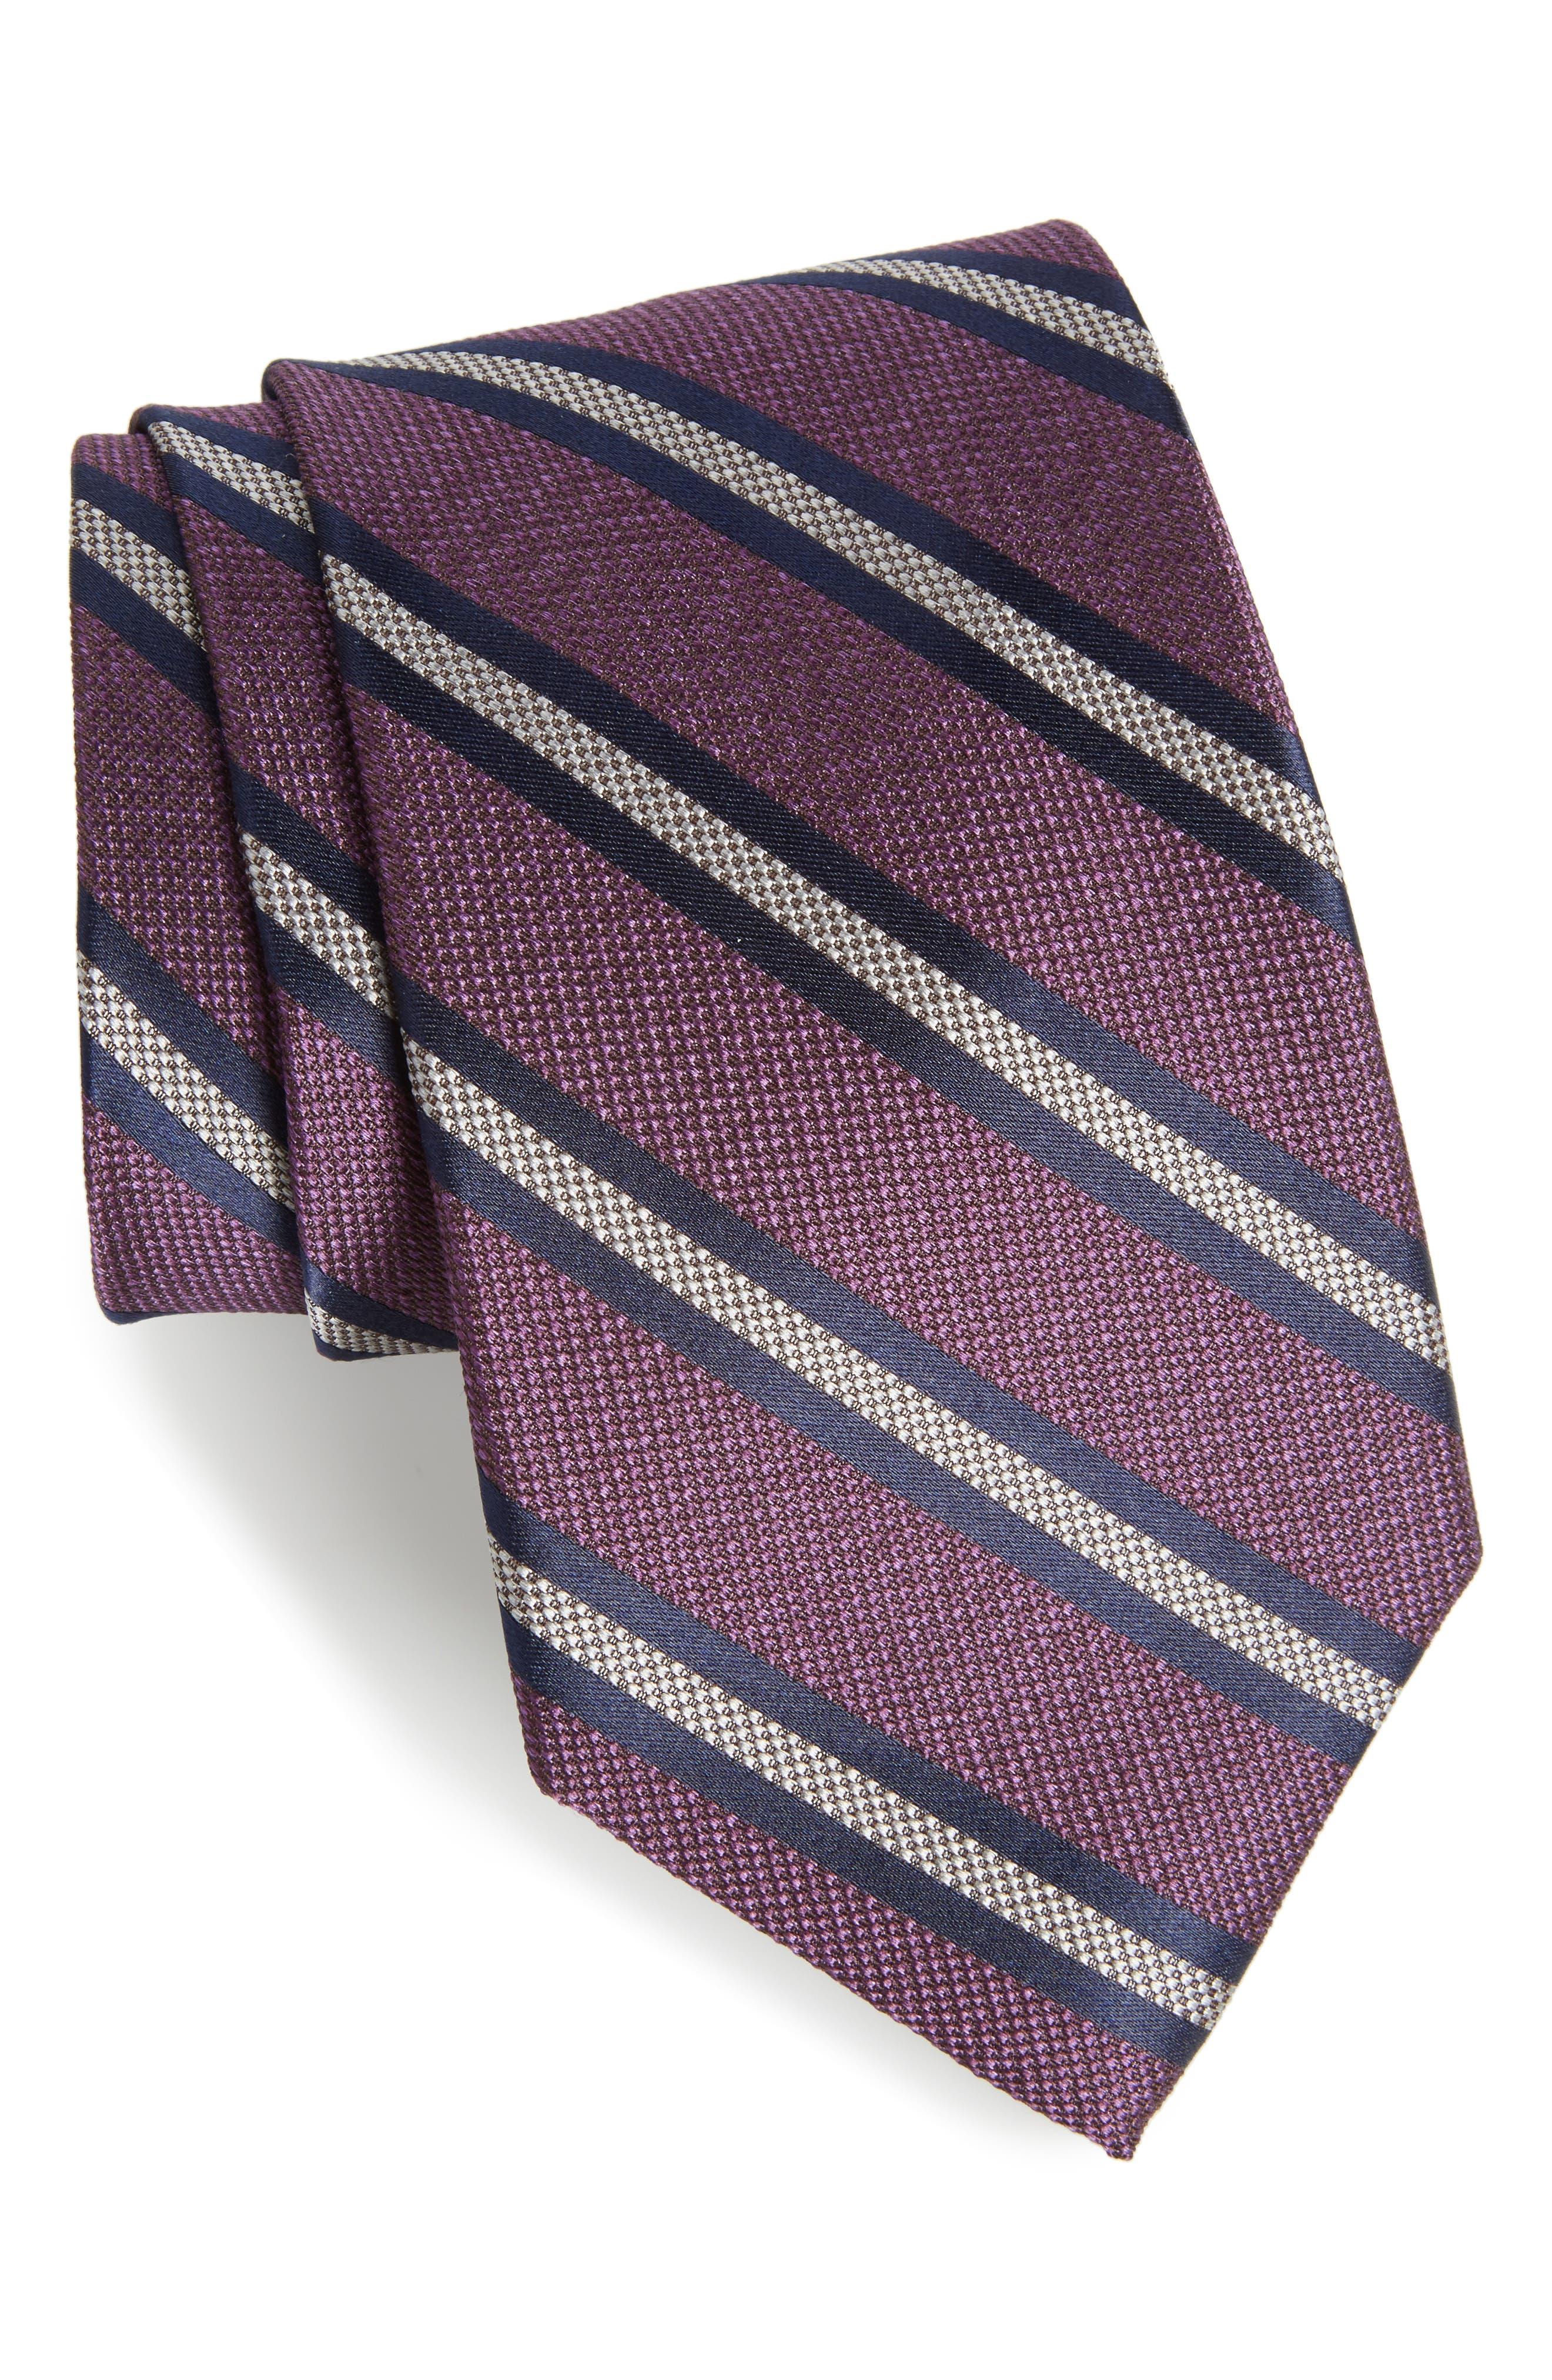 Nordstrom Men's Shop Oxford Stripe Silk Tie (X-Long)